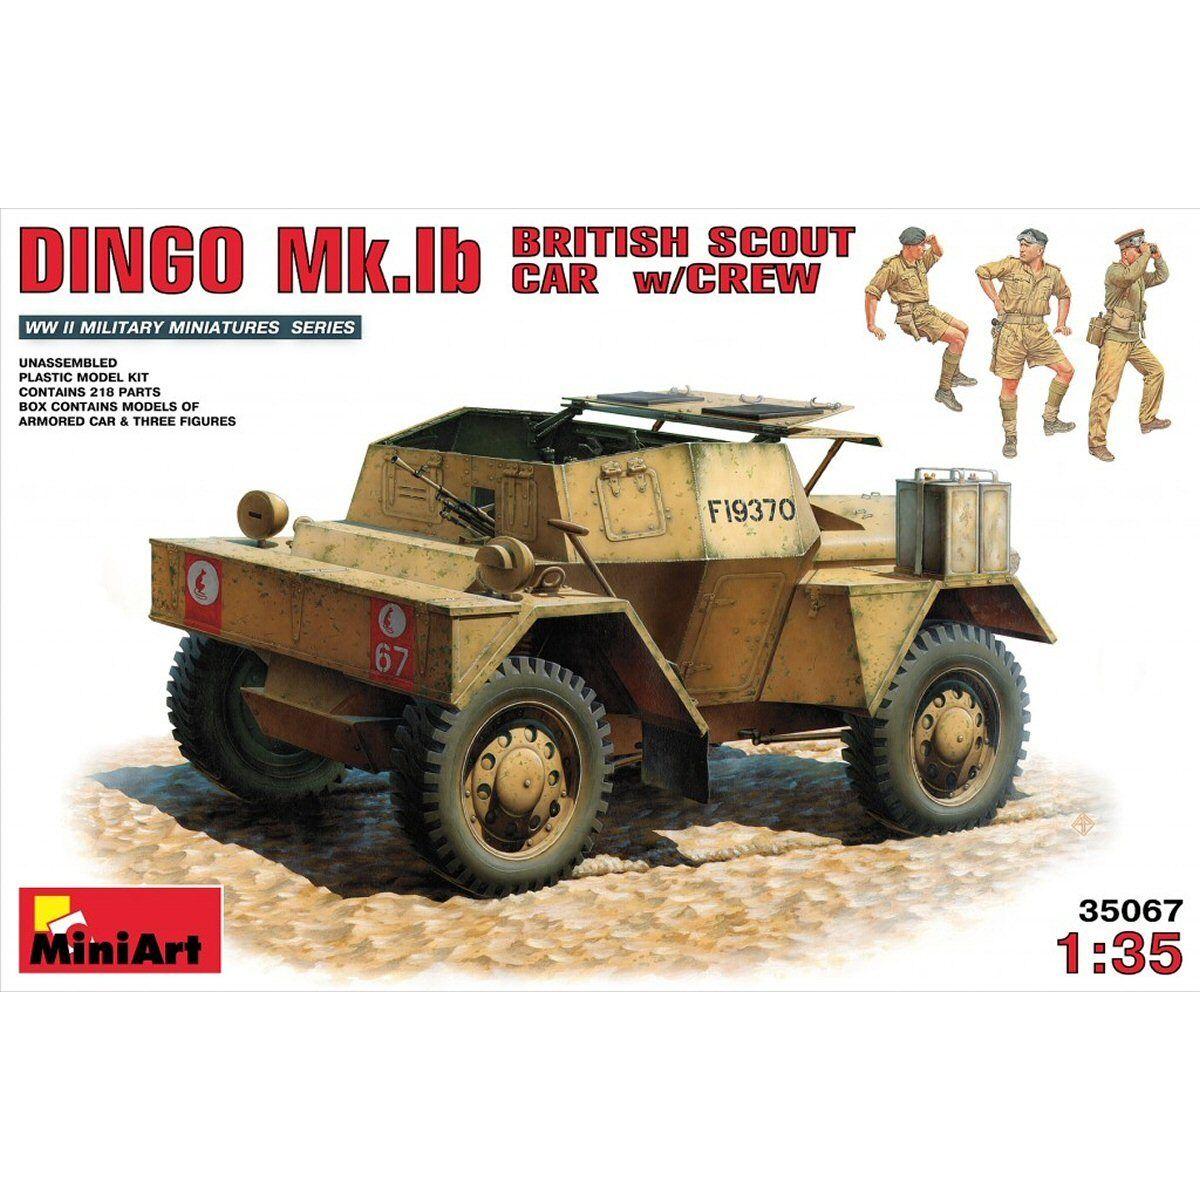 MiniArt 35067 British Scout Car DINGO MkIb with crew 1 35 scale model kit